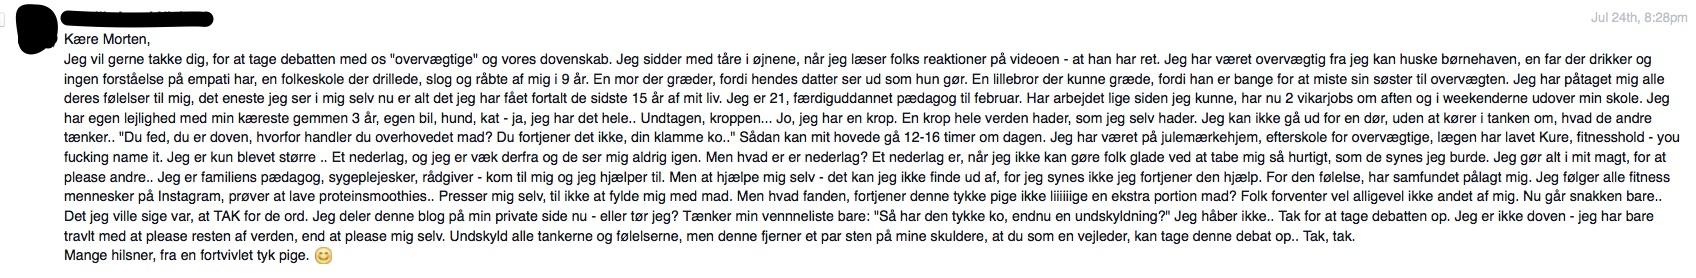 Proteinopskrifter_dk_-_Morten_Svane